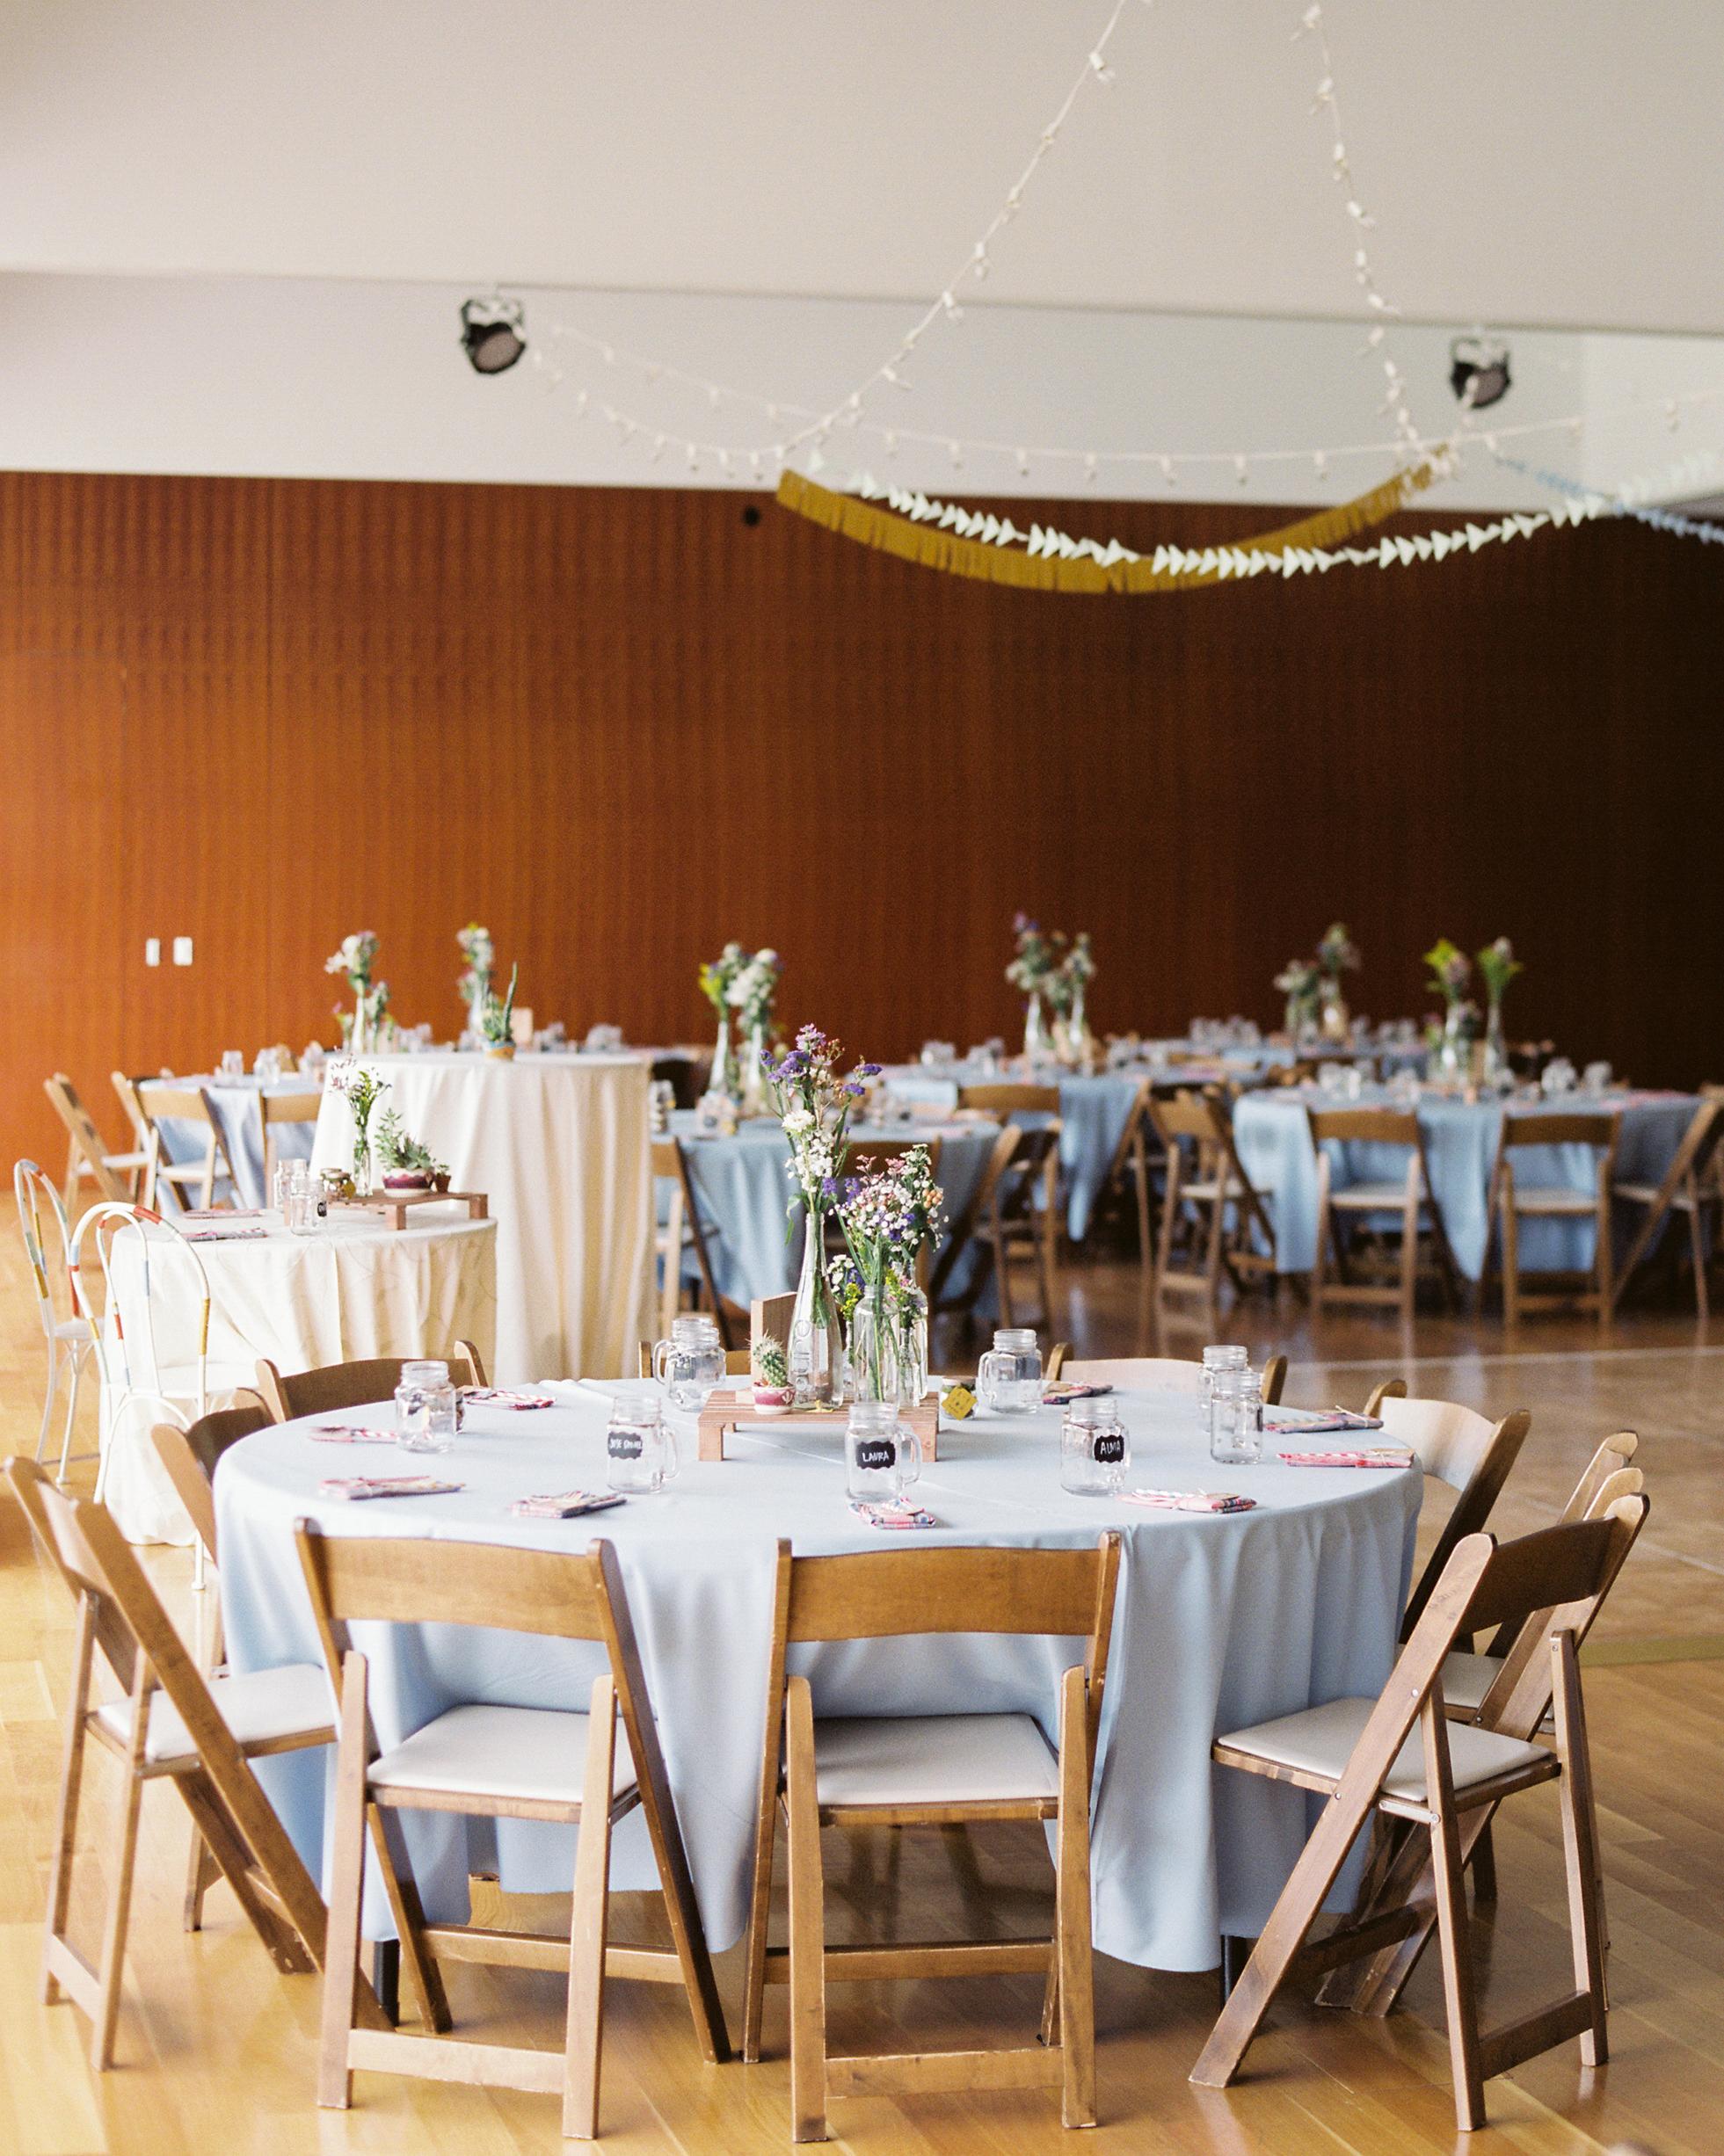 atalia-raul-wedding-reception-98-s112395-1215.jpg